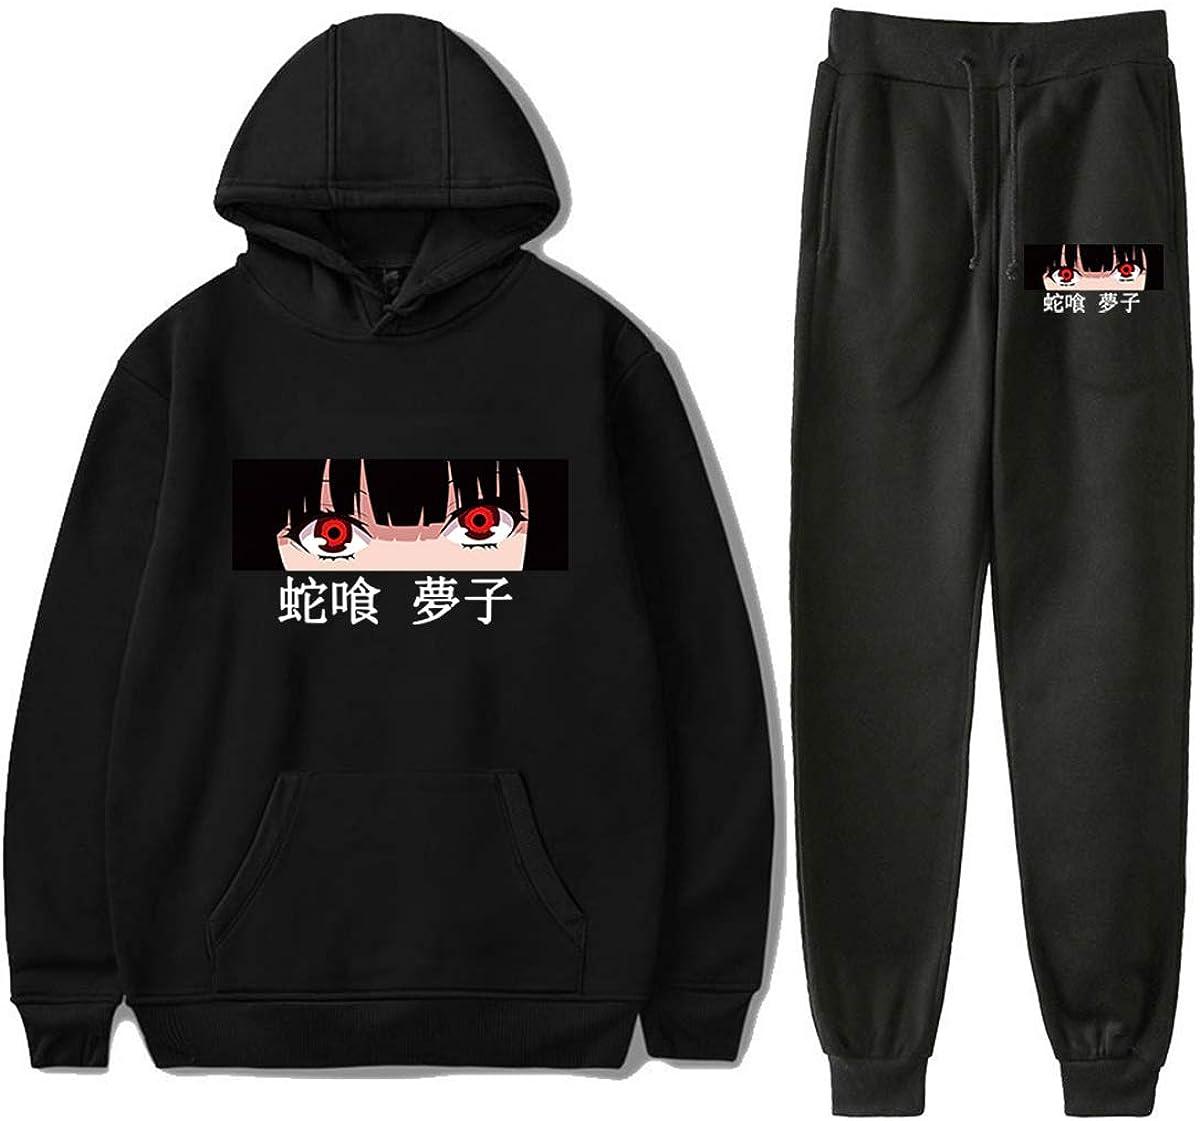 Kakegurui Anime Tracksuit Sets Youth Hoodie and Sweatpants Suit Outfit Fashion Sweatshirt Set for Women